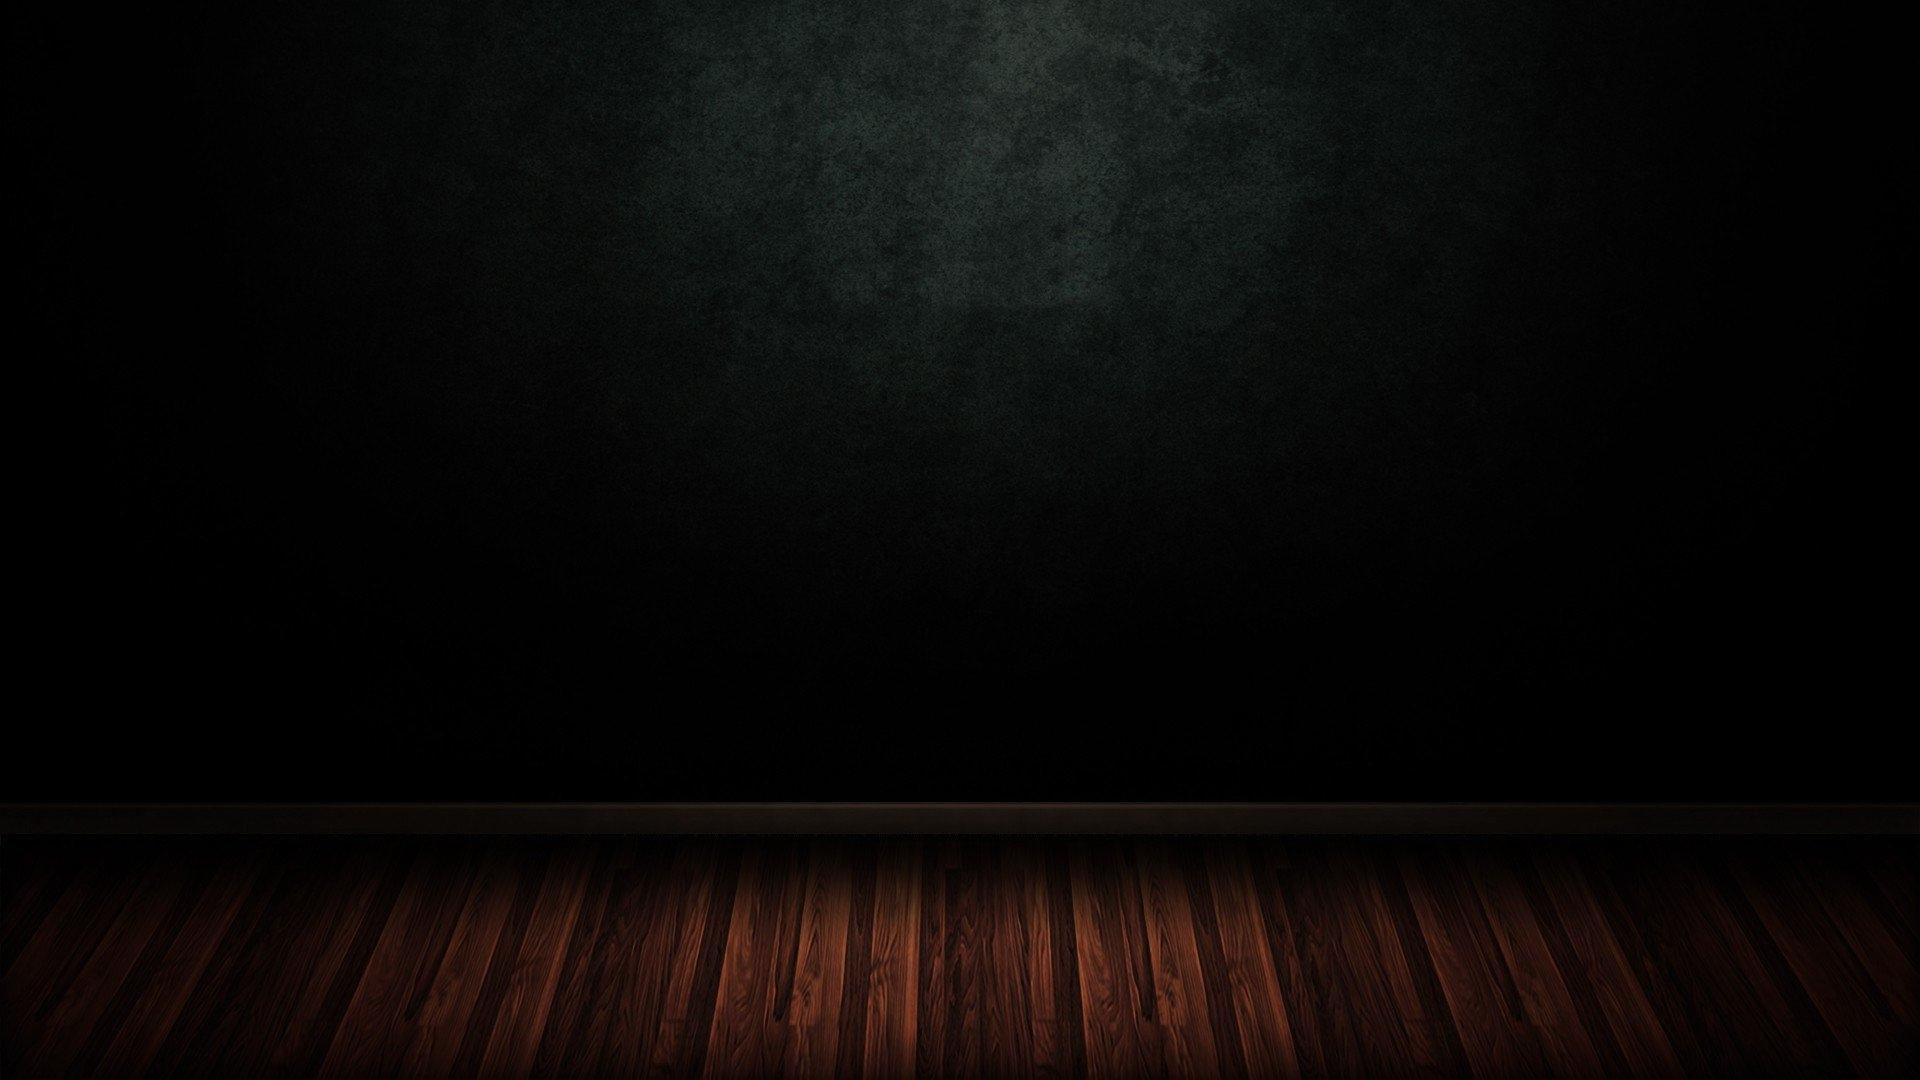 download Dark Light Room HD Wallpaper Background Images 1920x1080